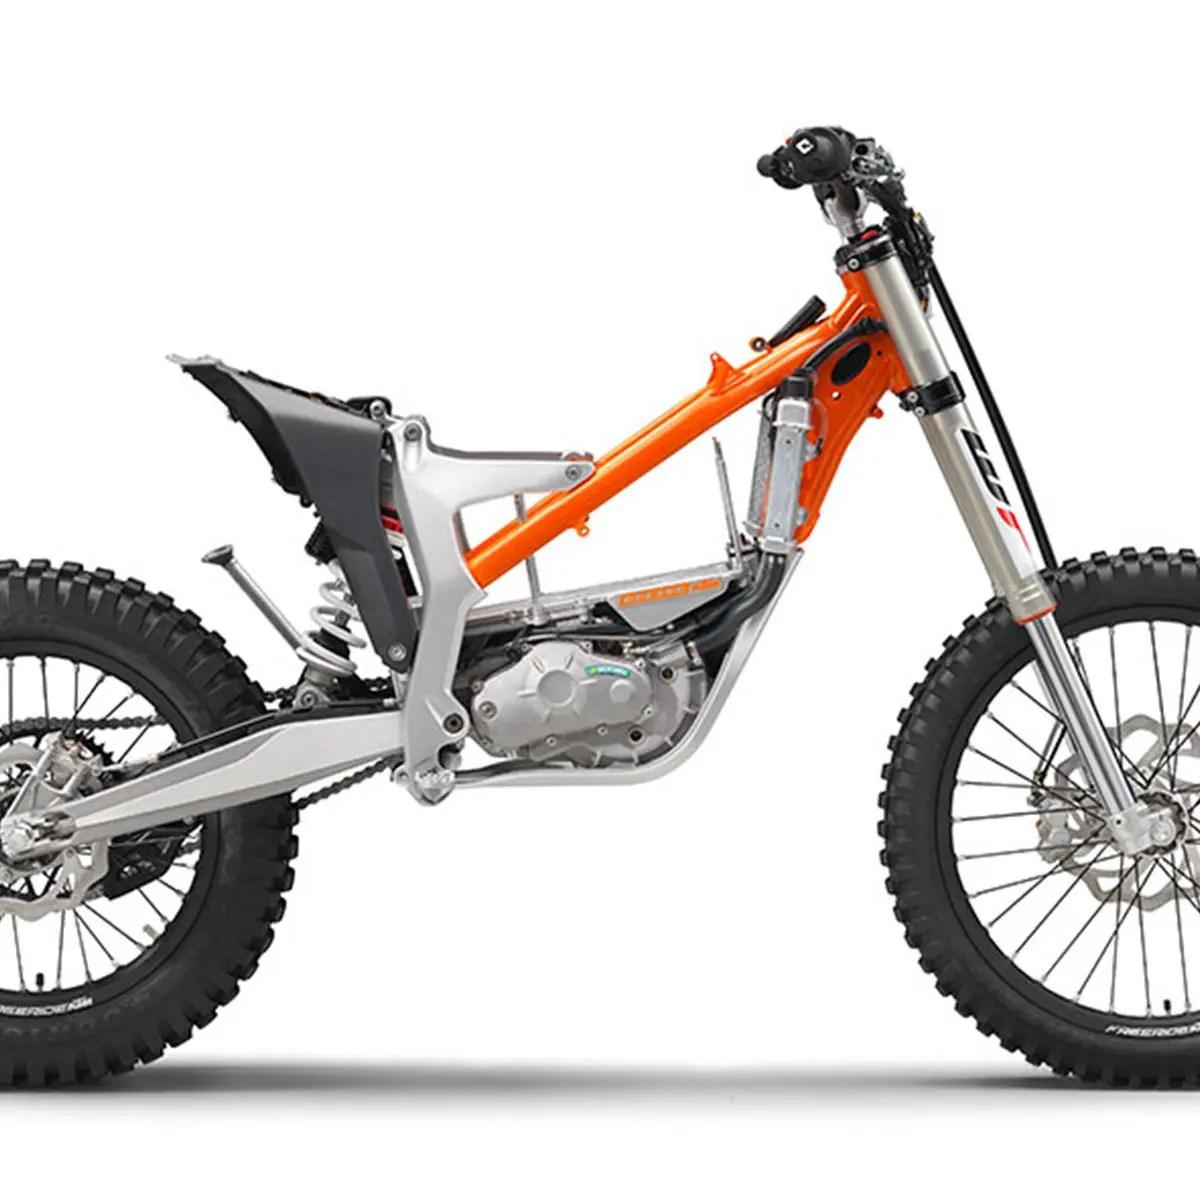 CADRE-KTM-FREERIDE-E-XC-2020